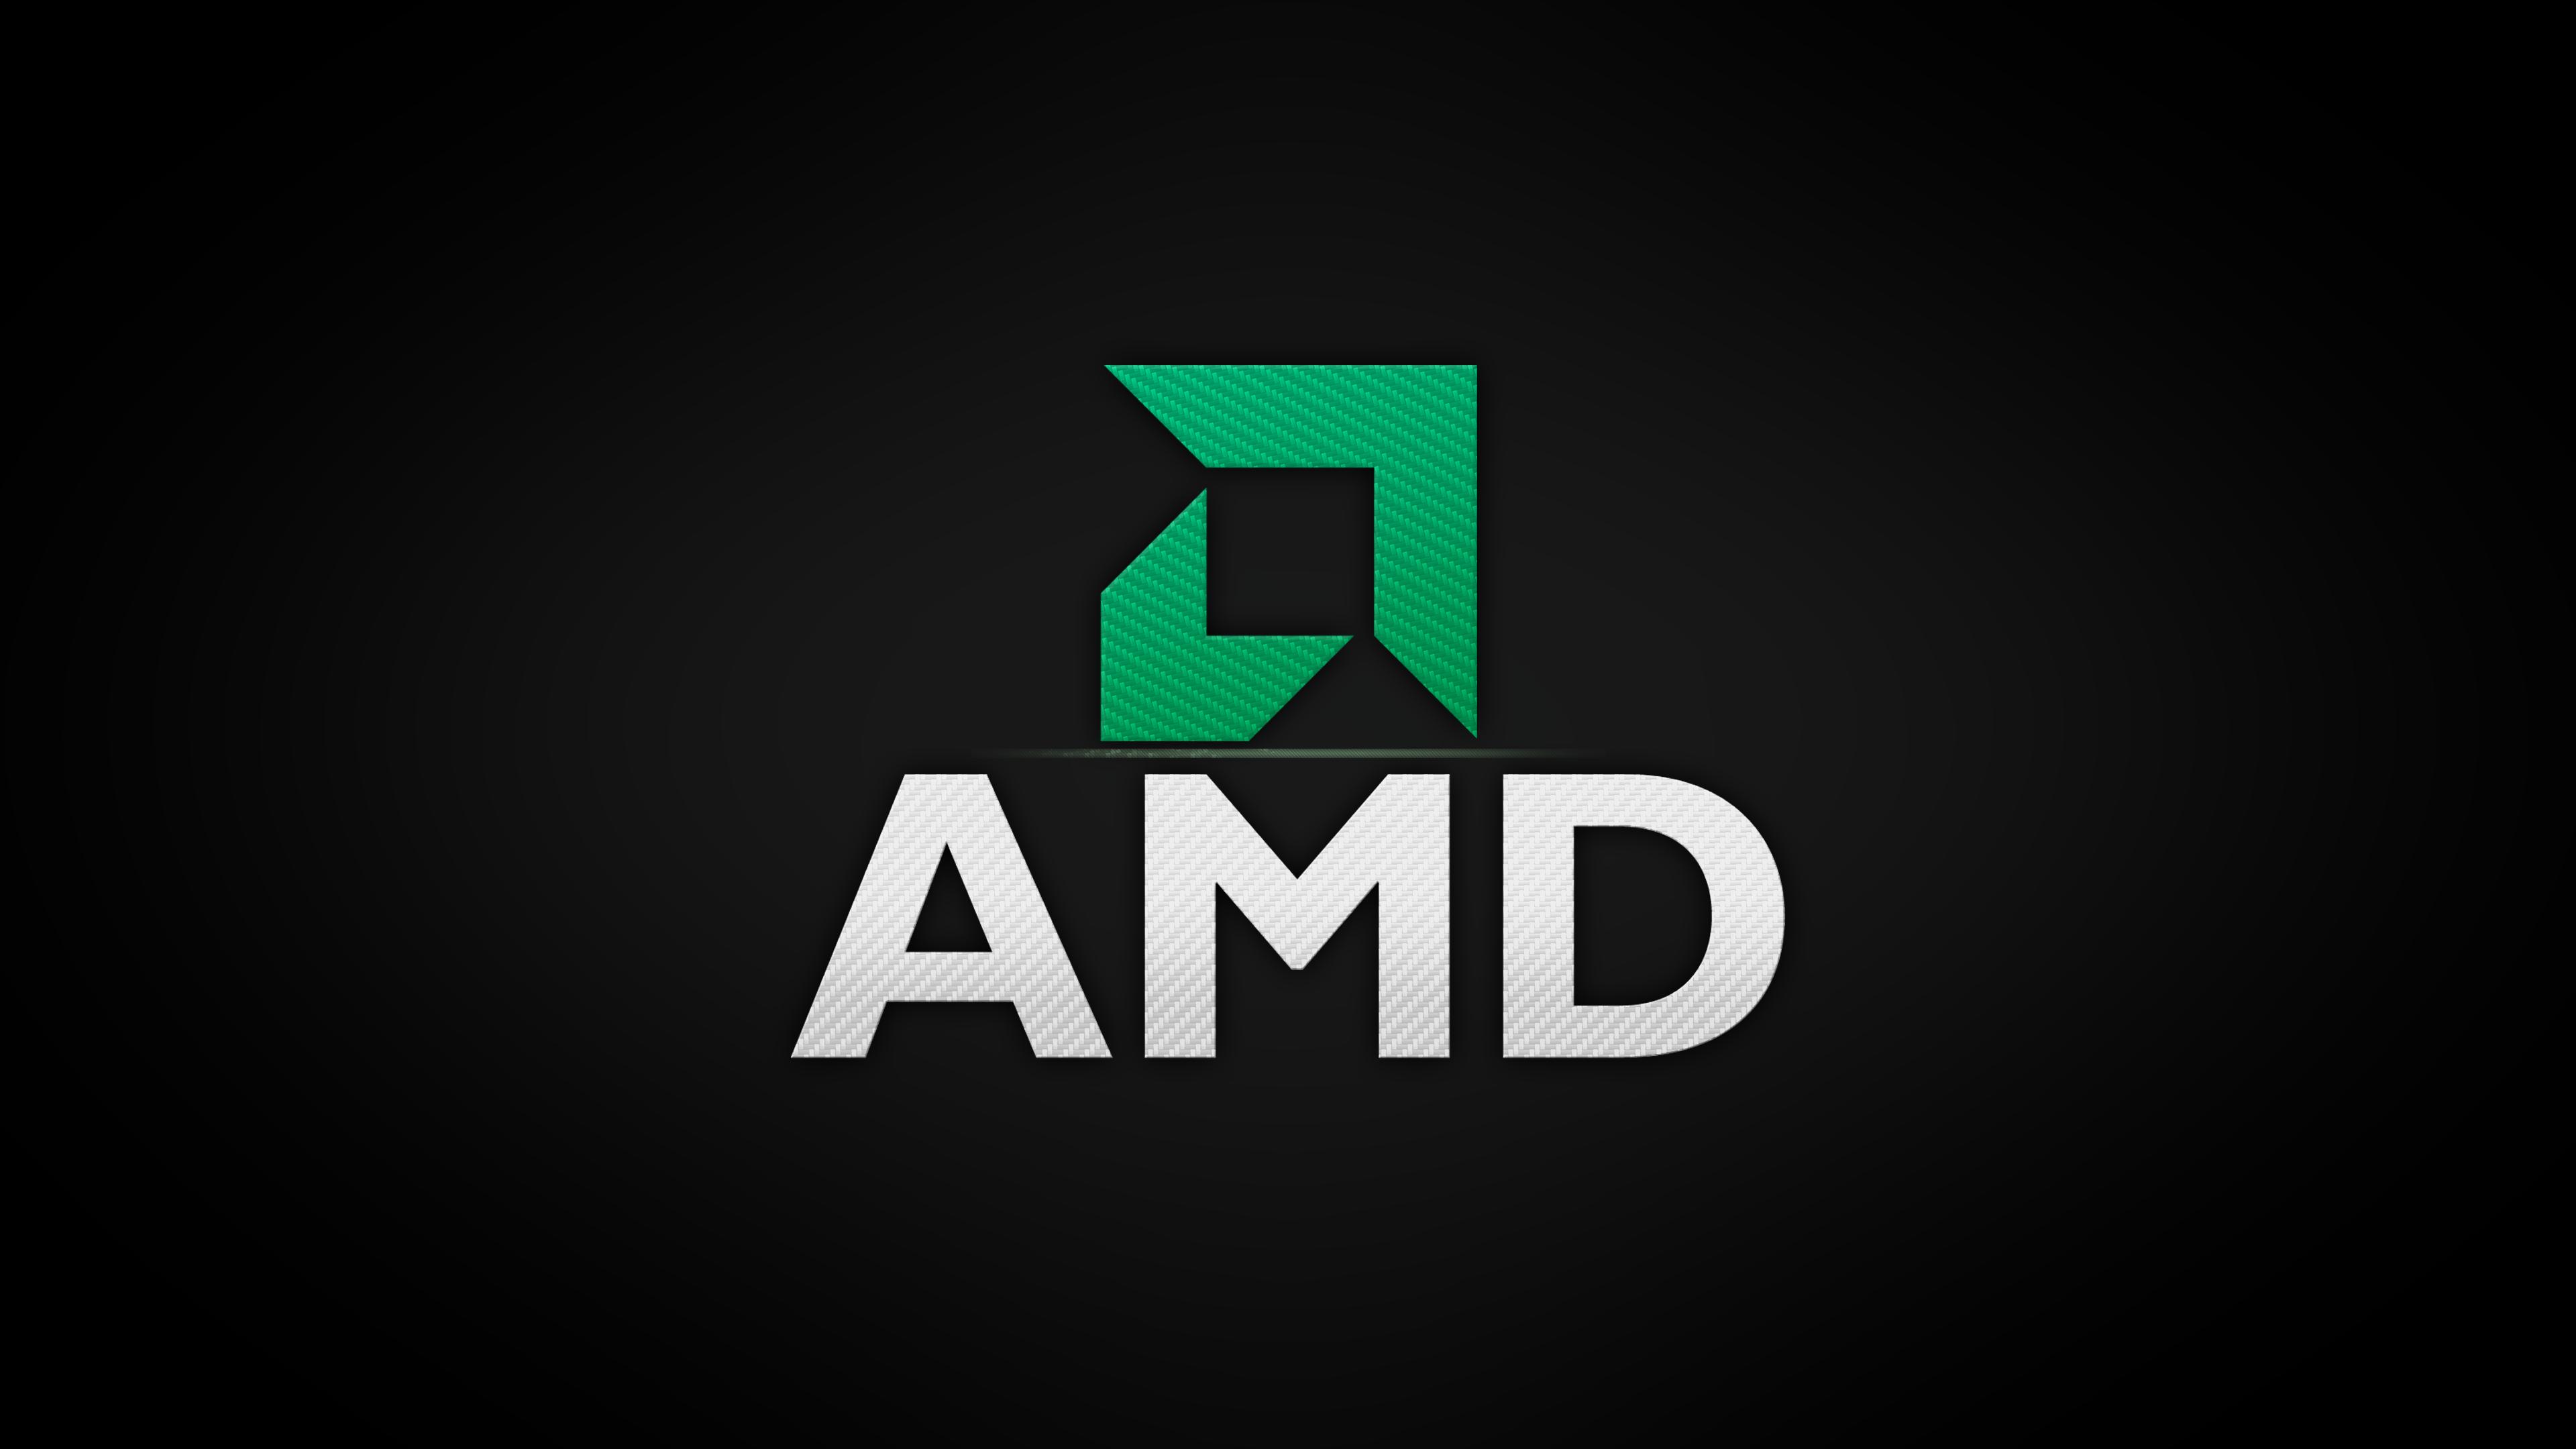 Amd Brand Logo, HD Logo, 4k Wallpapers, Images ...